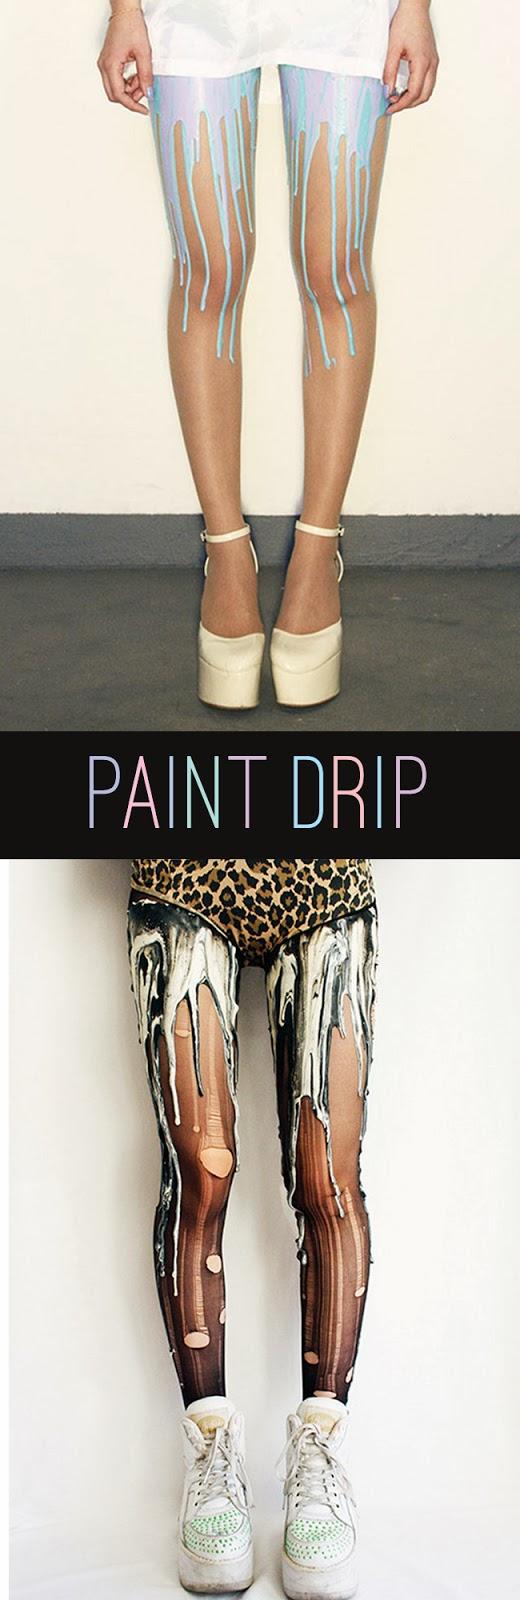 Melting Paint Drip Tights